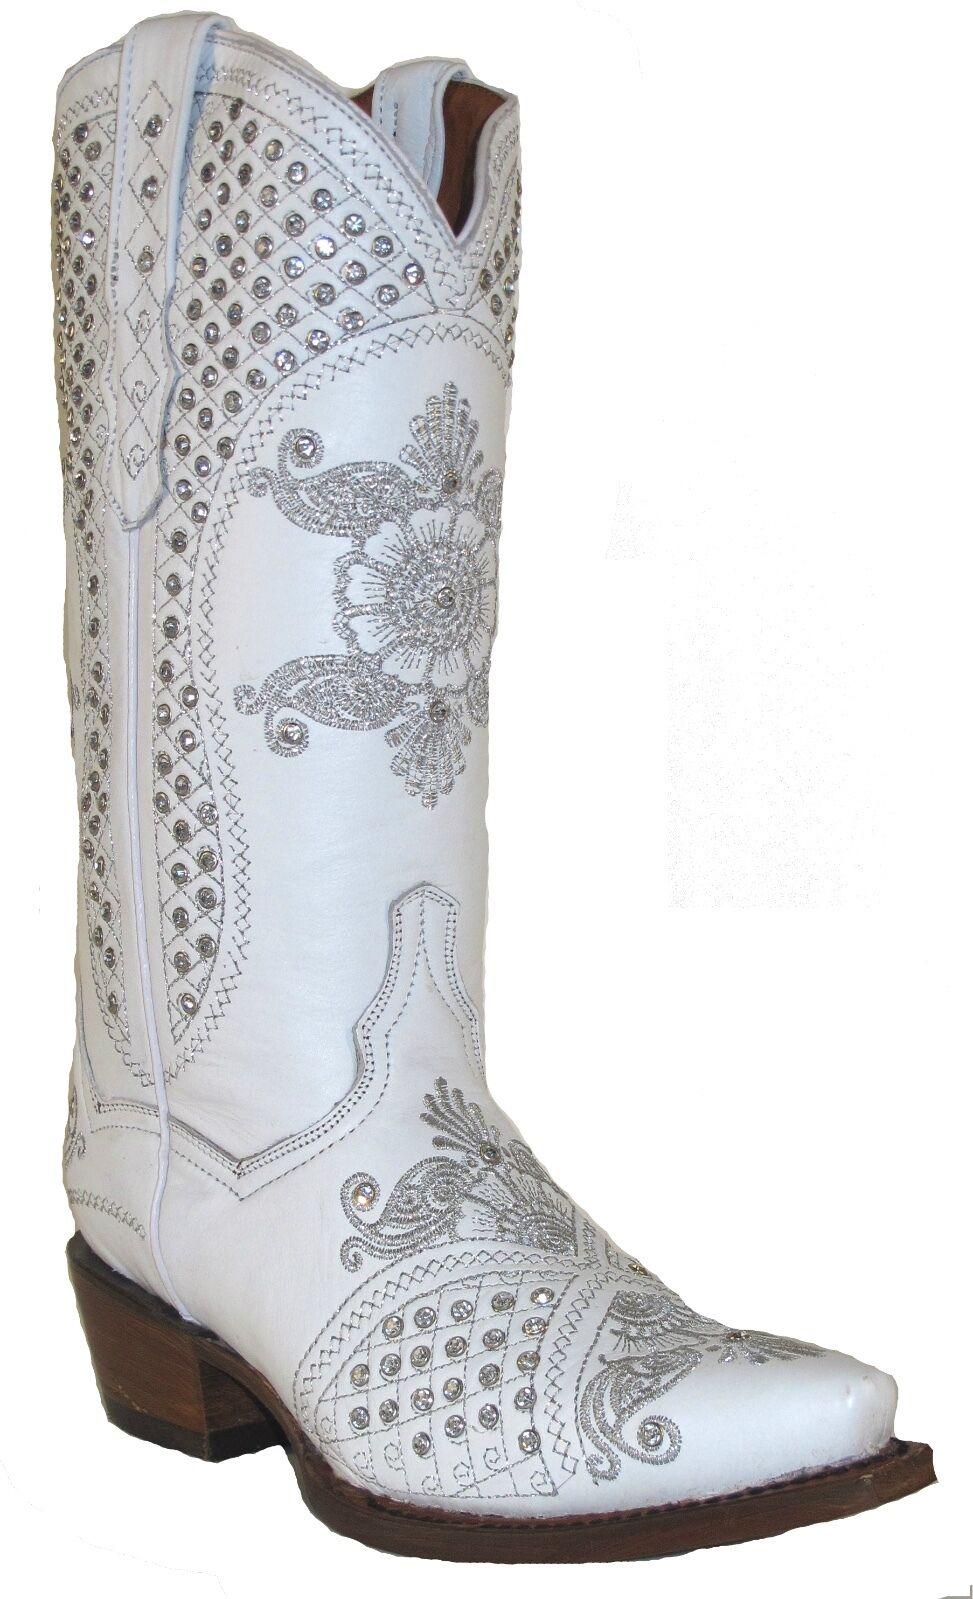 Women's  Distressed Distressed Distressed Leather Full Rhinestone Cowgirl Western Boots Snip White dc5843